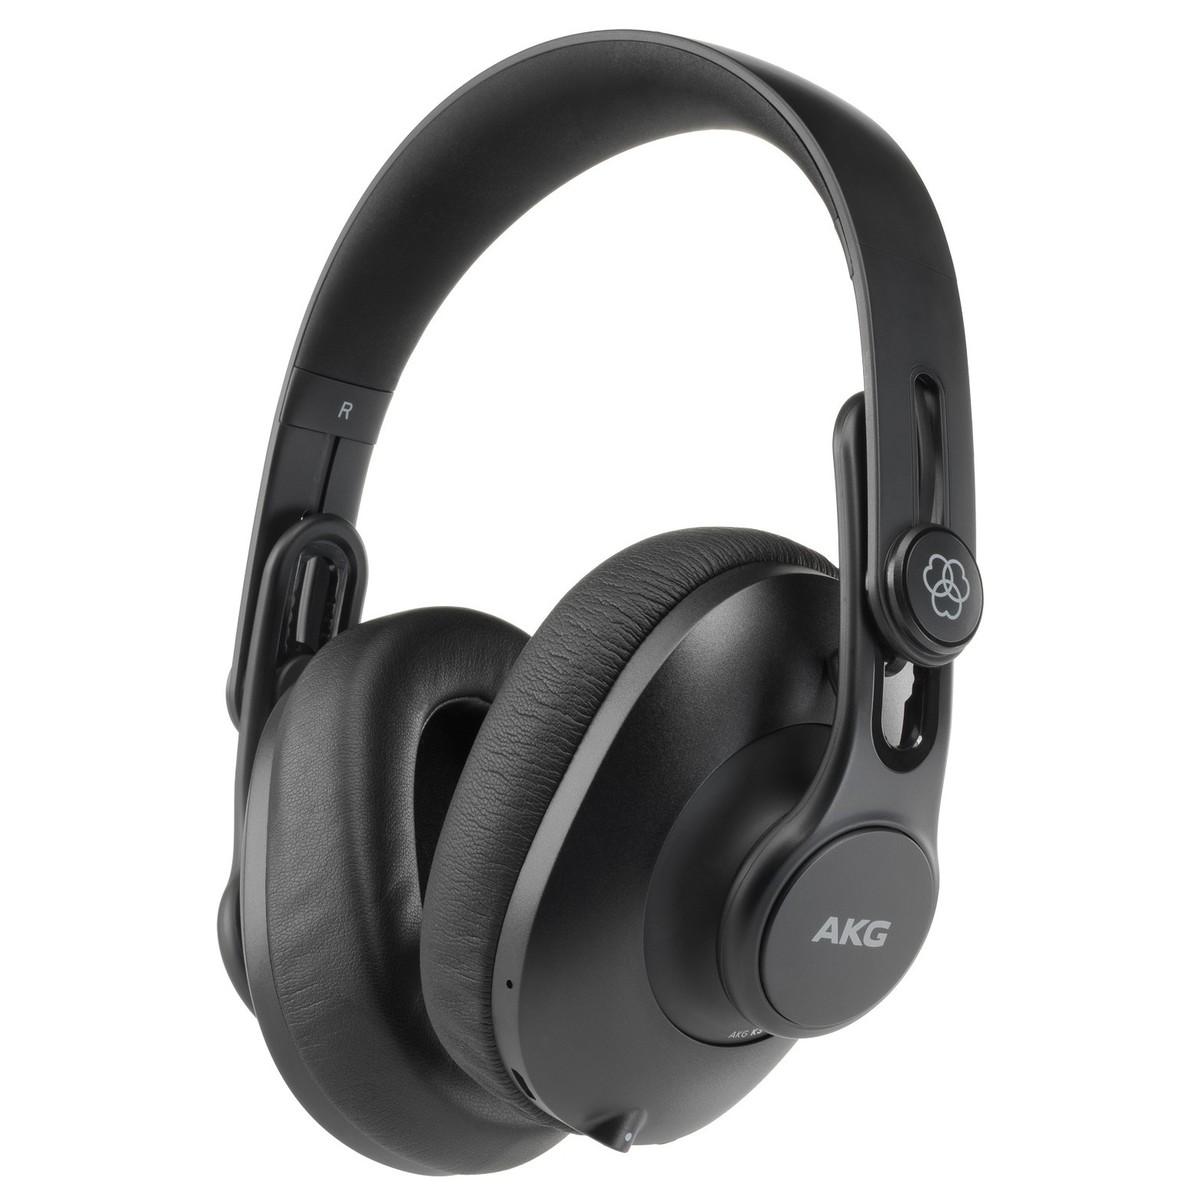 AKG K361-BT Studio Headphones with Bluetooth